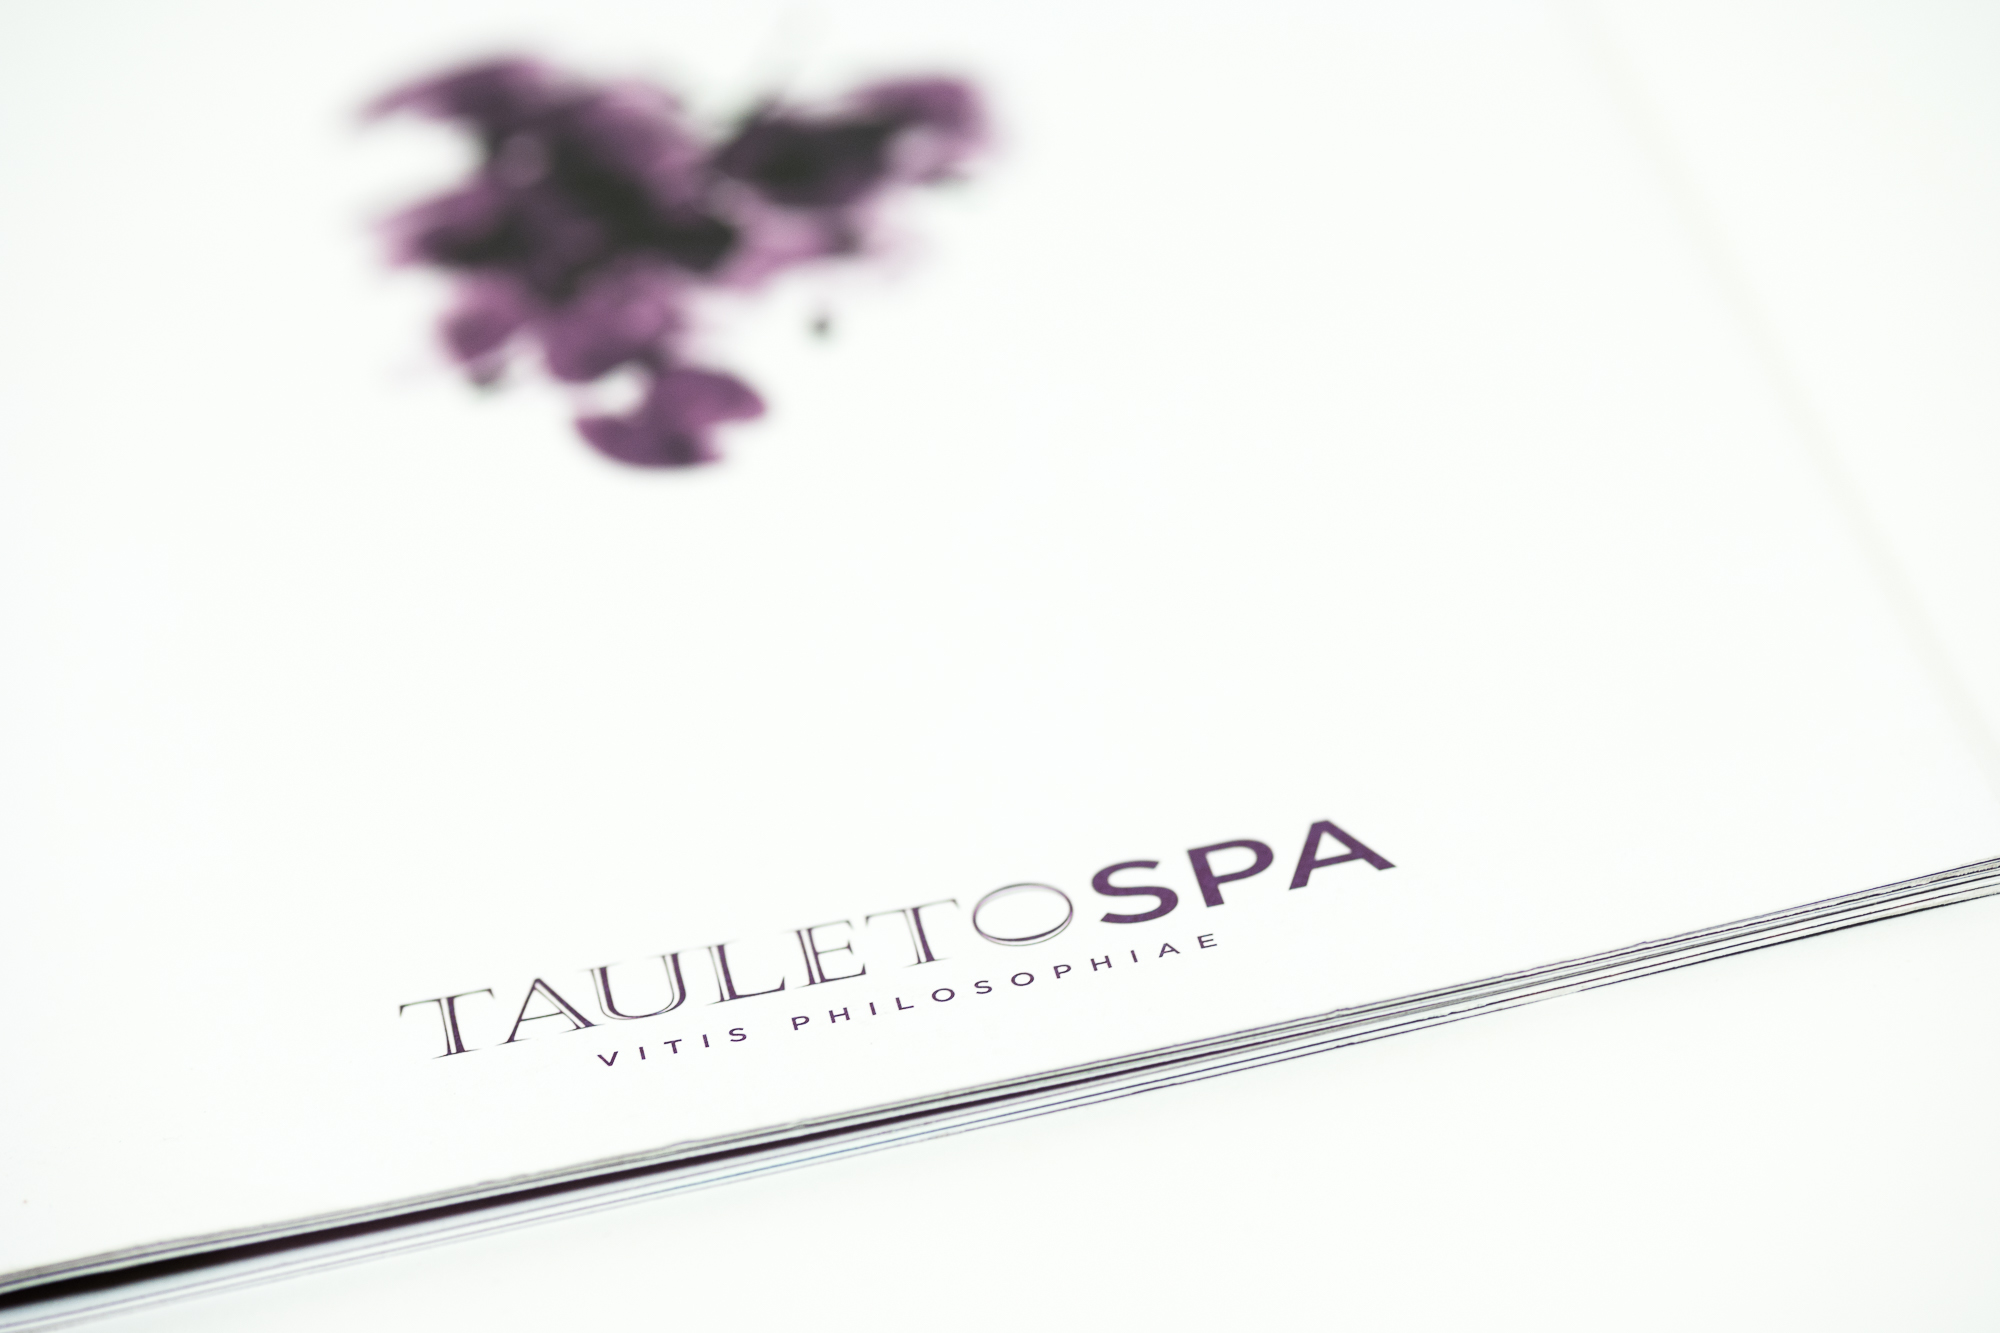 Tauleto-2